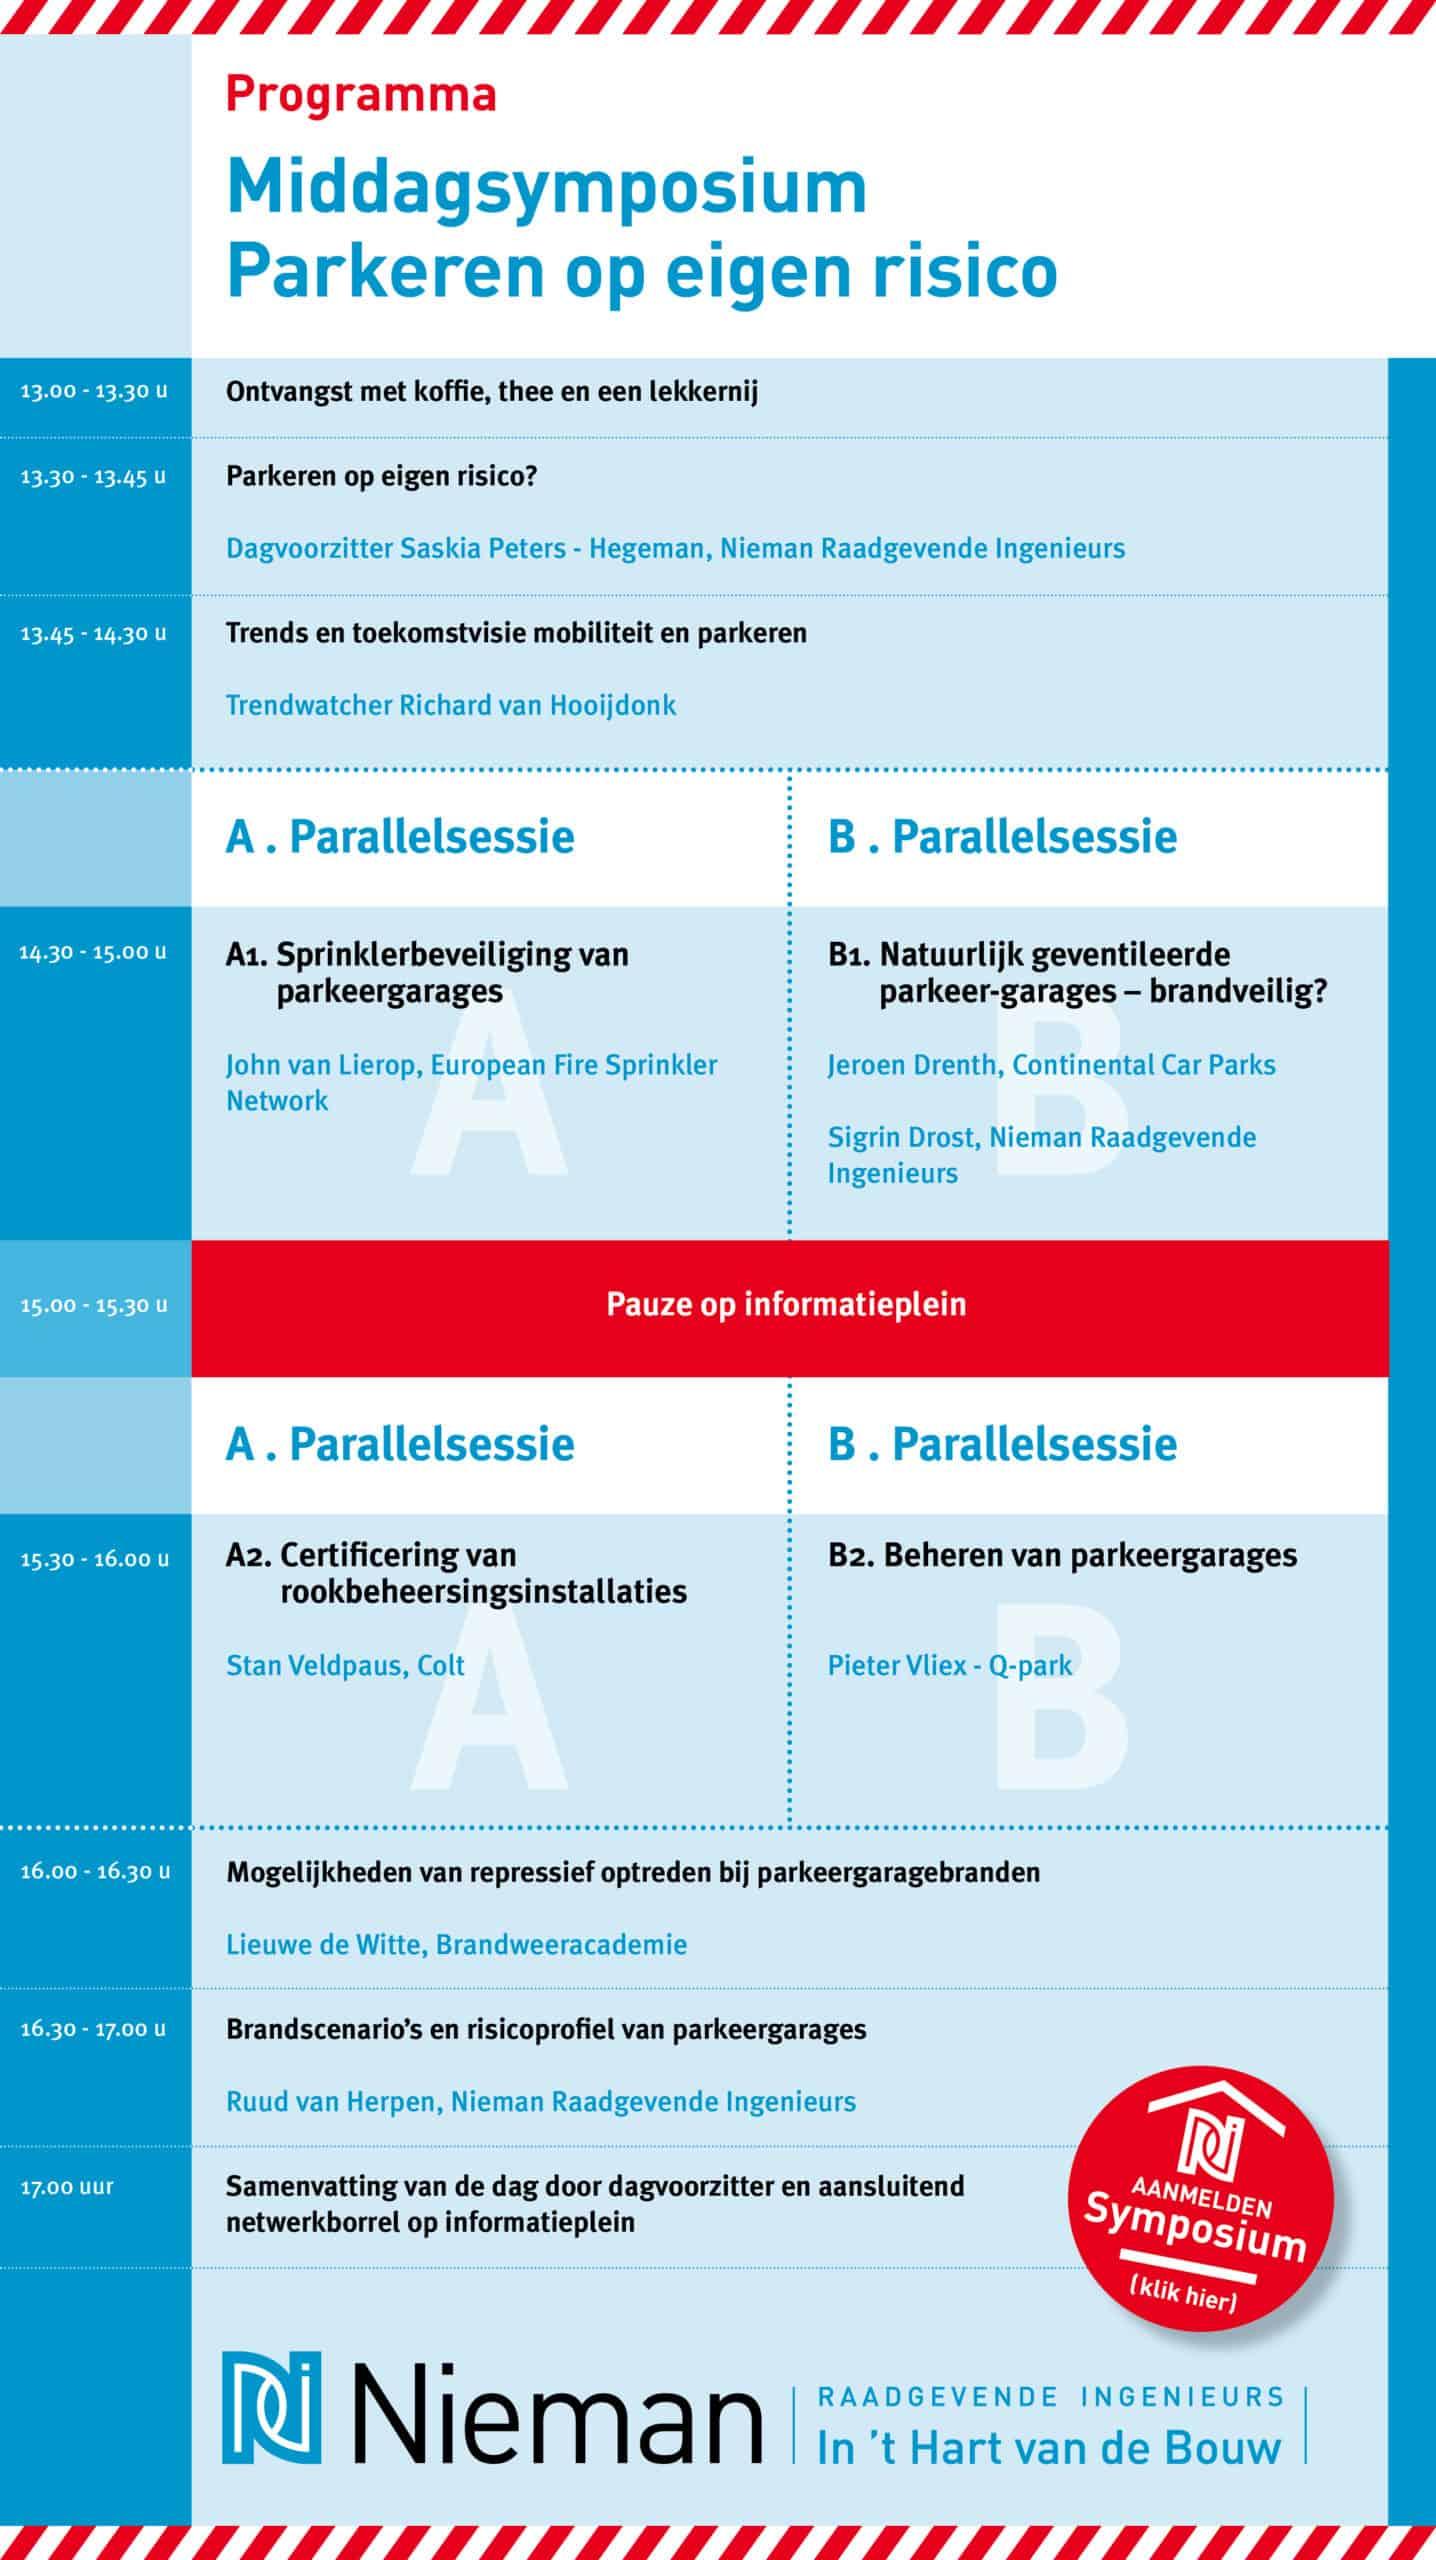 Programma_Parkeren_op_eigen_risico_22-11-17